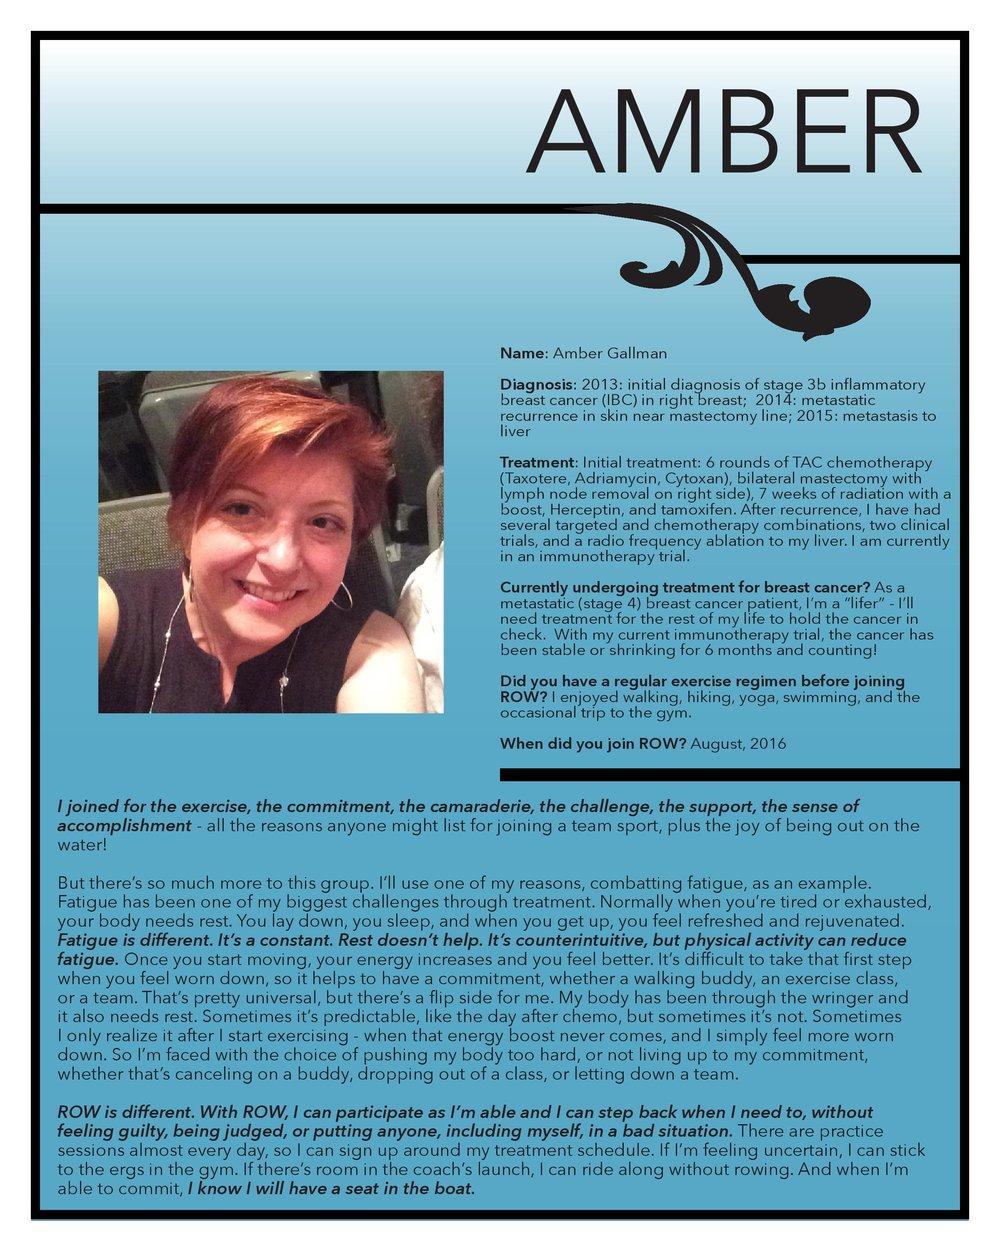 AmberGallman_pROWfile (1)-page-001.jpg